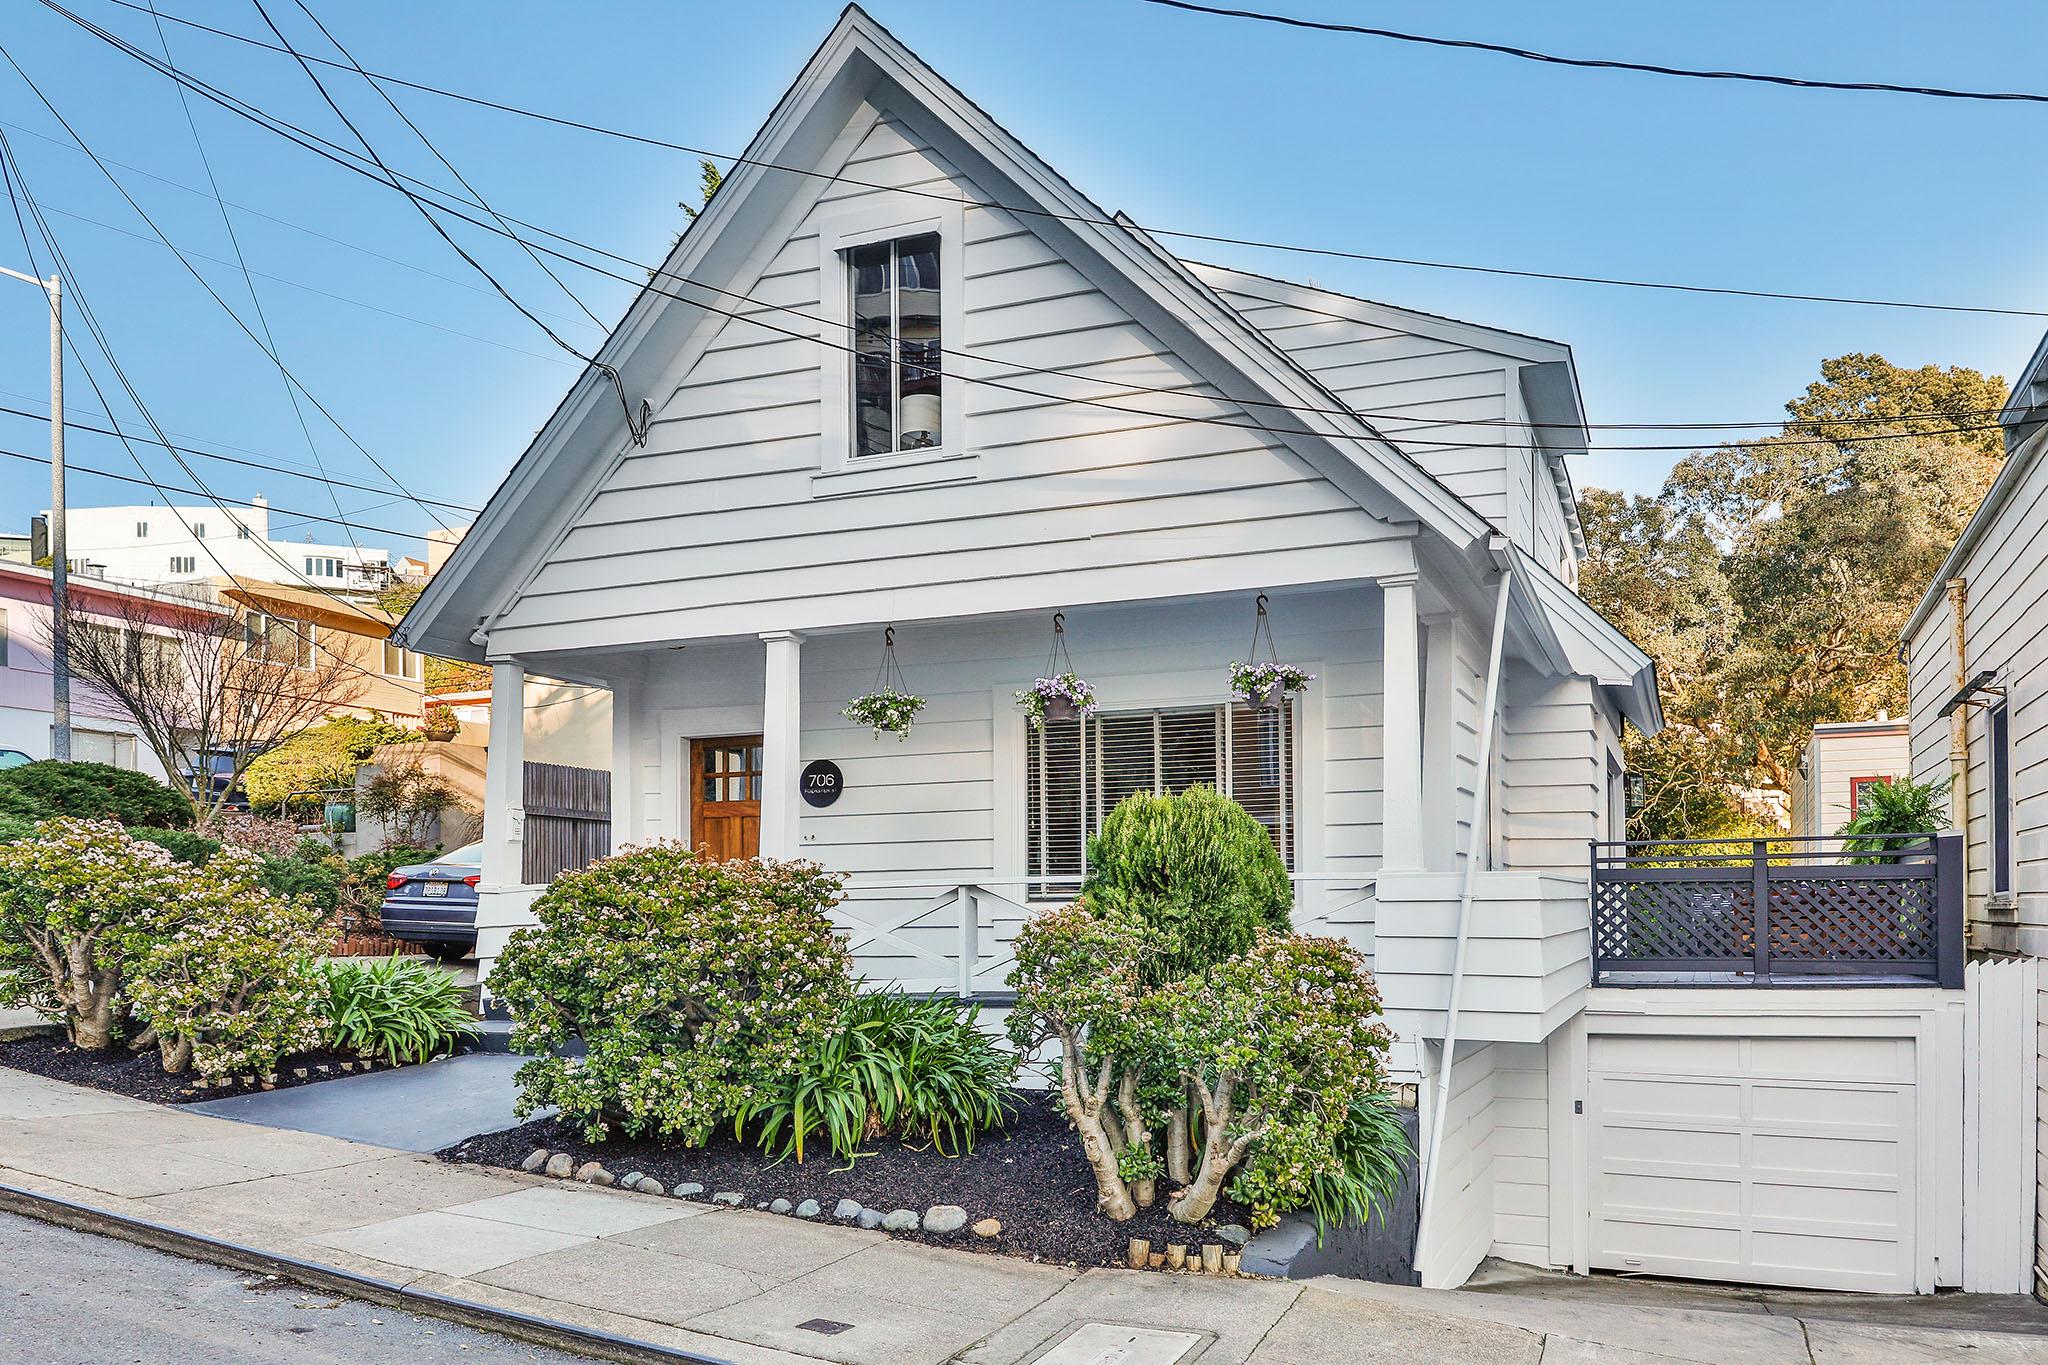 SF Real Estate - outside of house